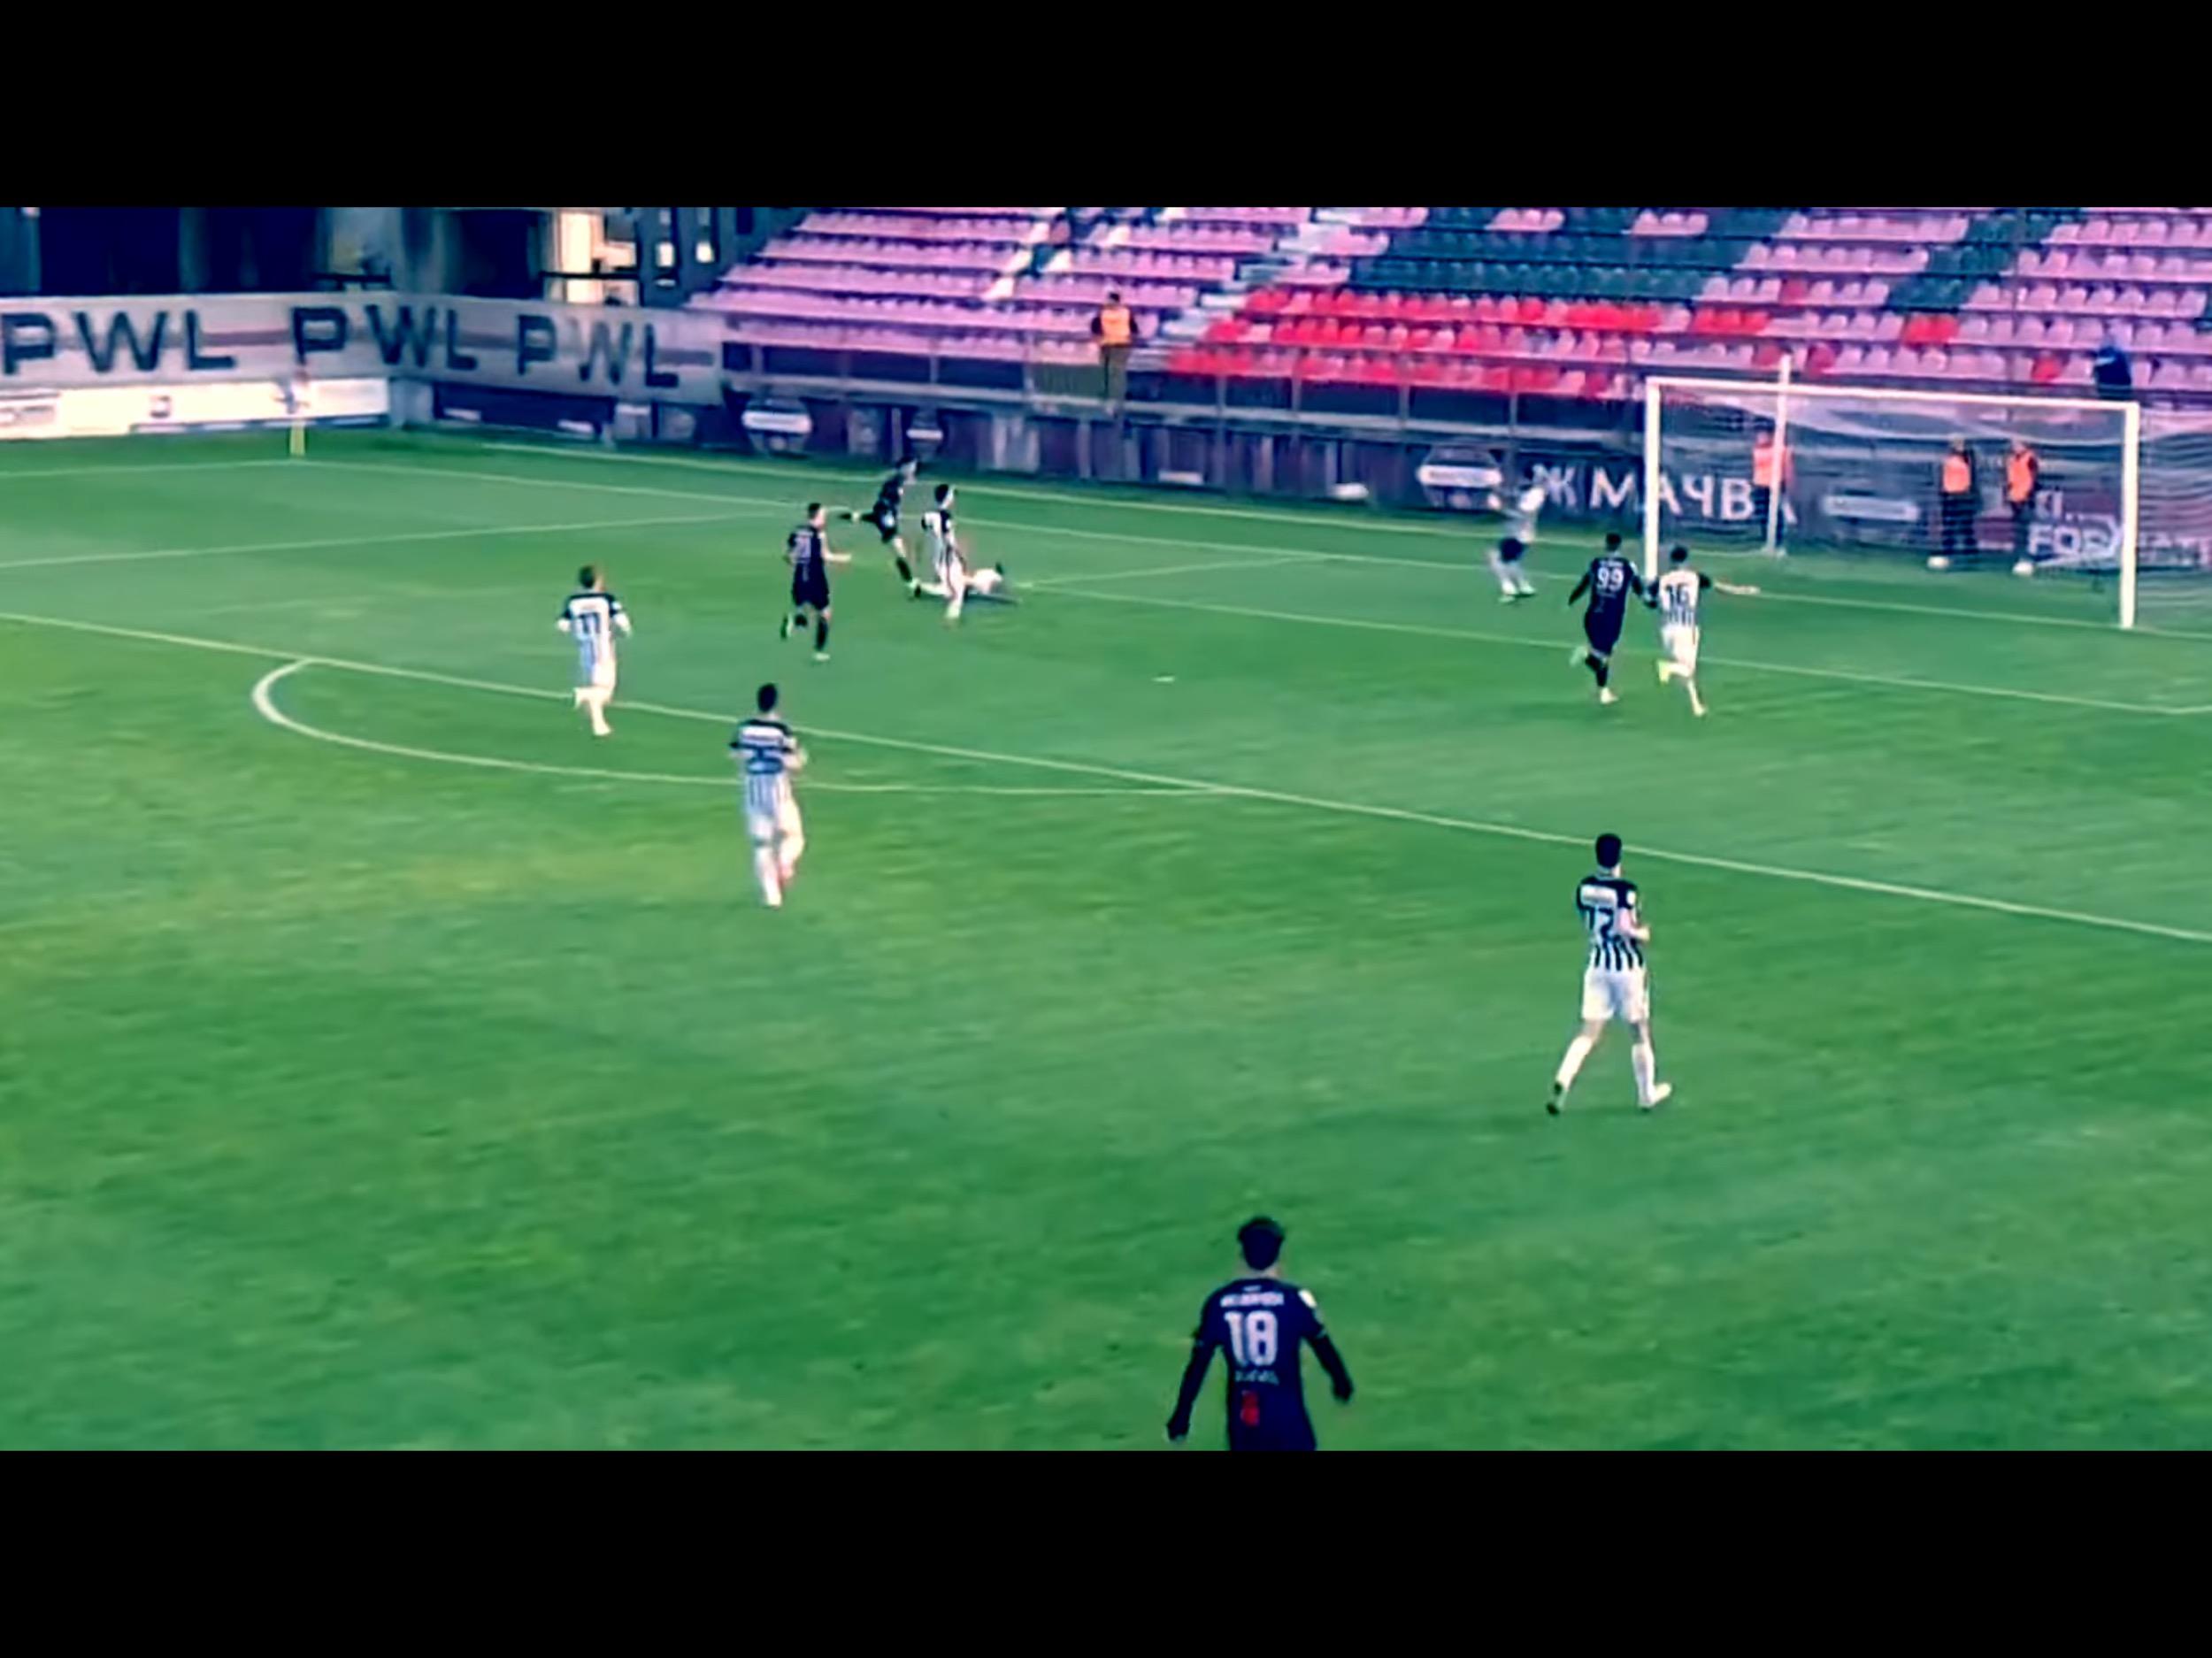 TV Izveštaj: Mačva-Partizan 1:2. Rutinska pobeda Partizana nad spektakularnim golmanom Gordićem… (VIDEO)